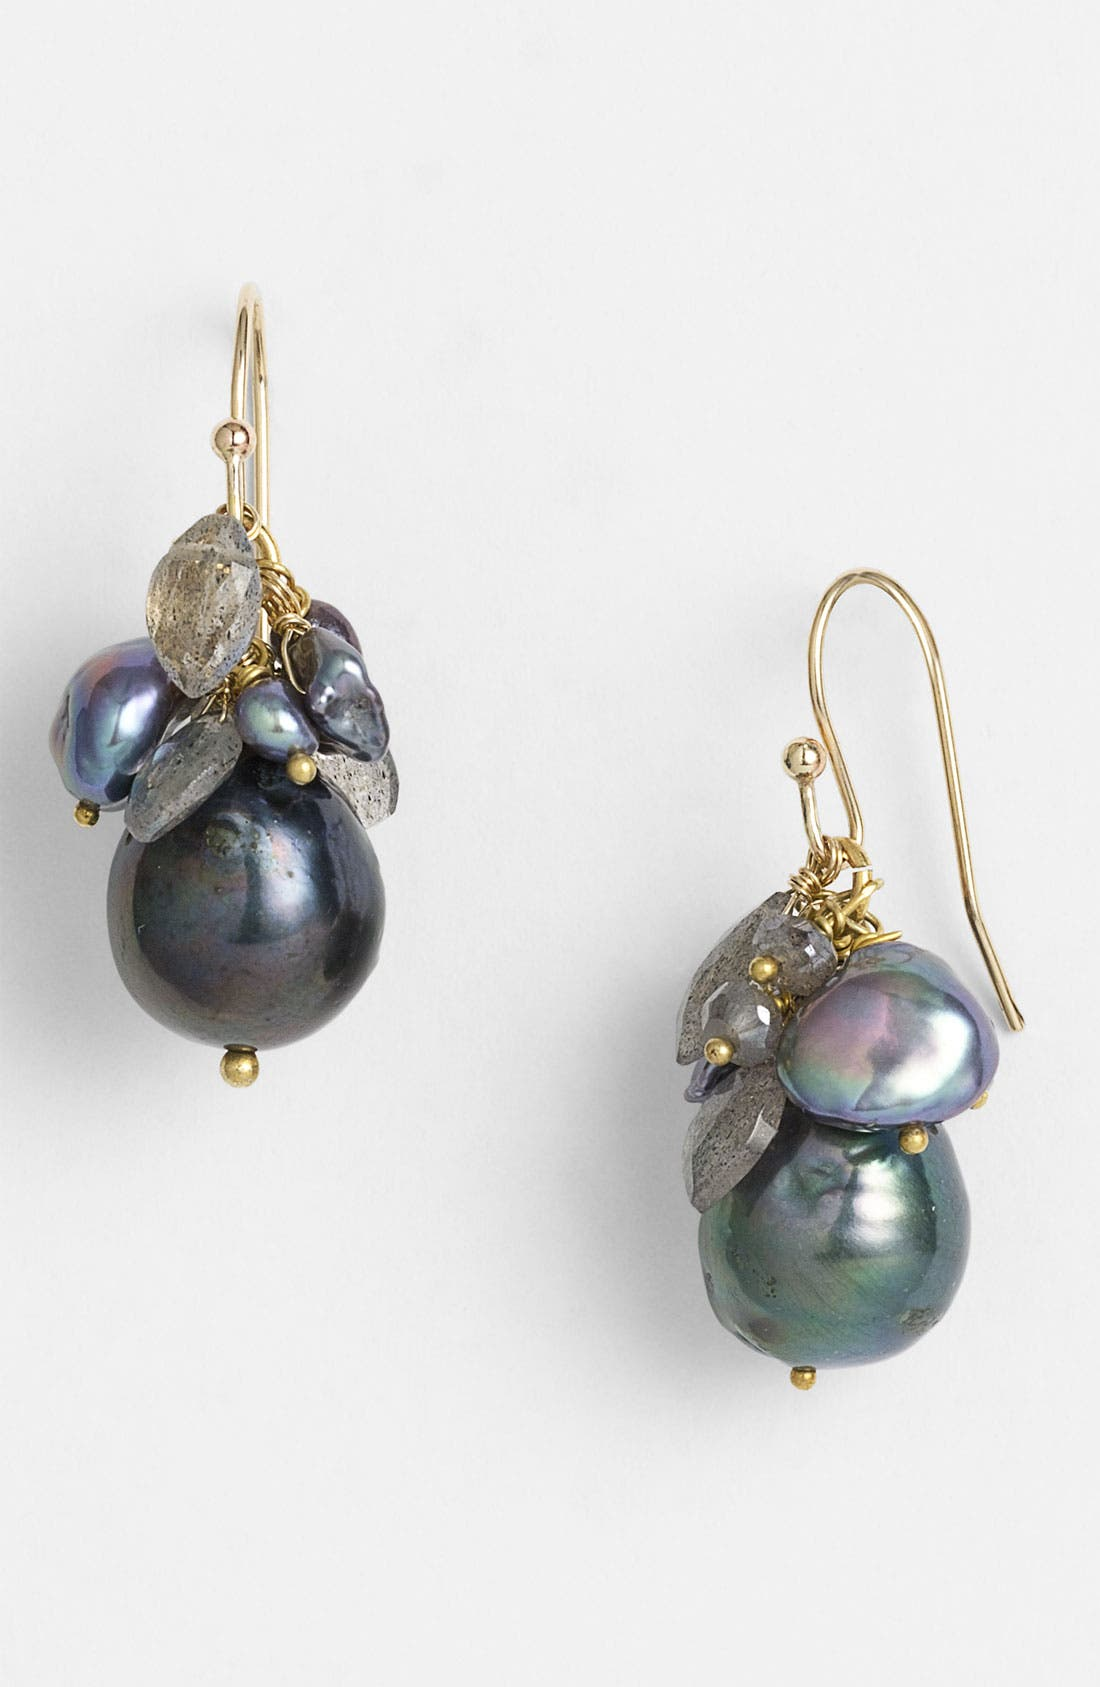 Alternate Image 1 Selected - Alexis Bittar 'Elements' Cluster Earrings (Nordstrom Exclusive)